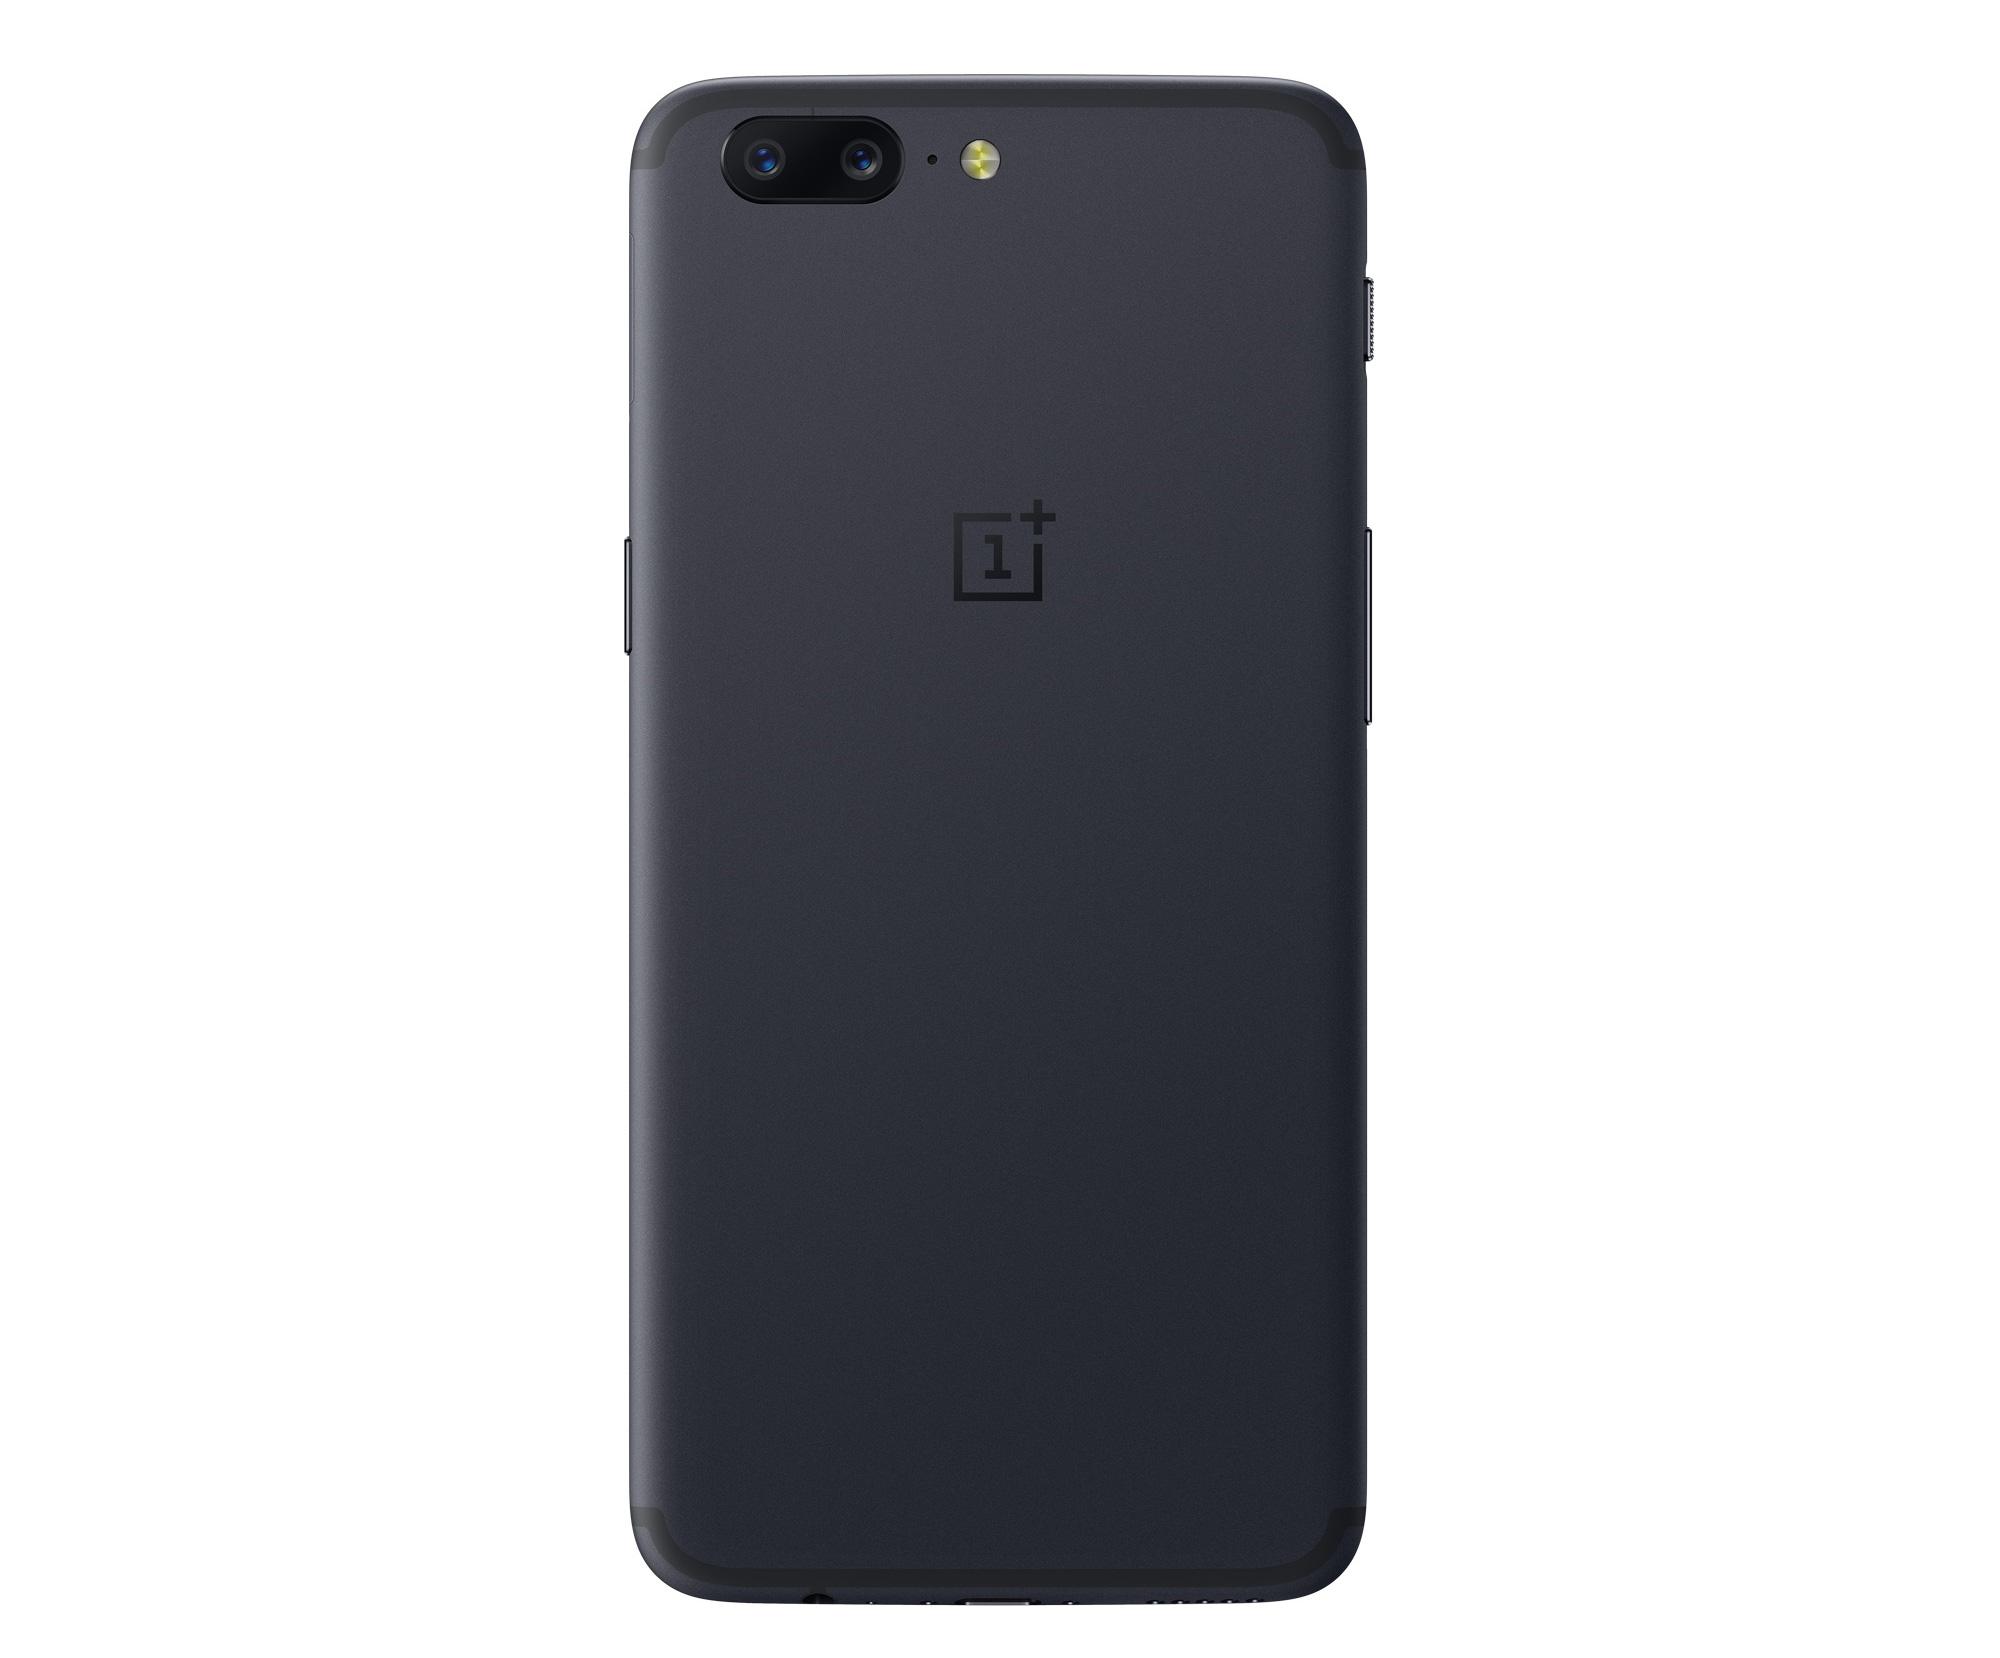 OnePlus 5 rear